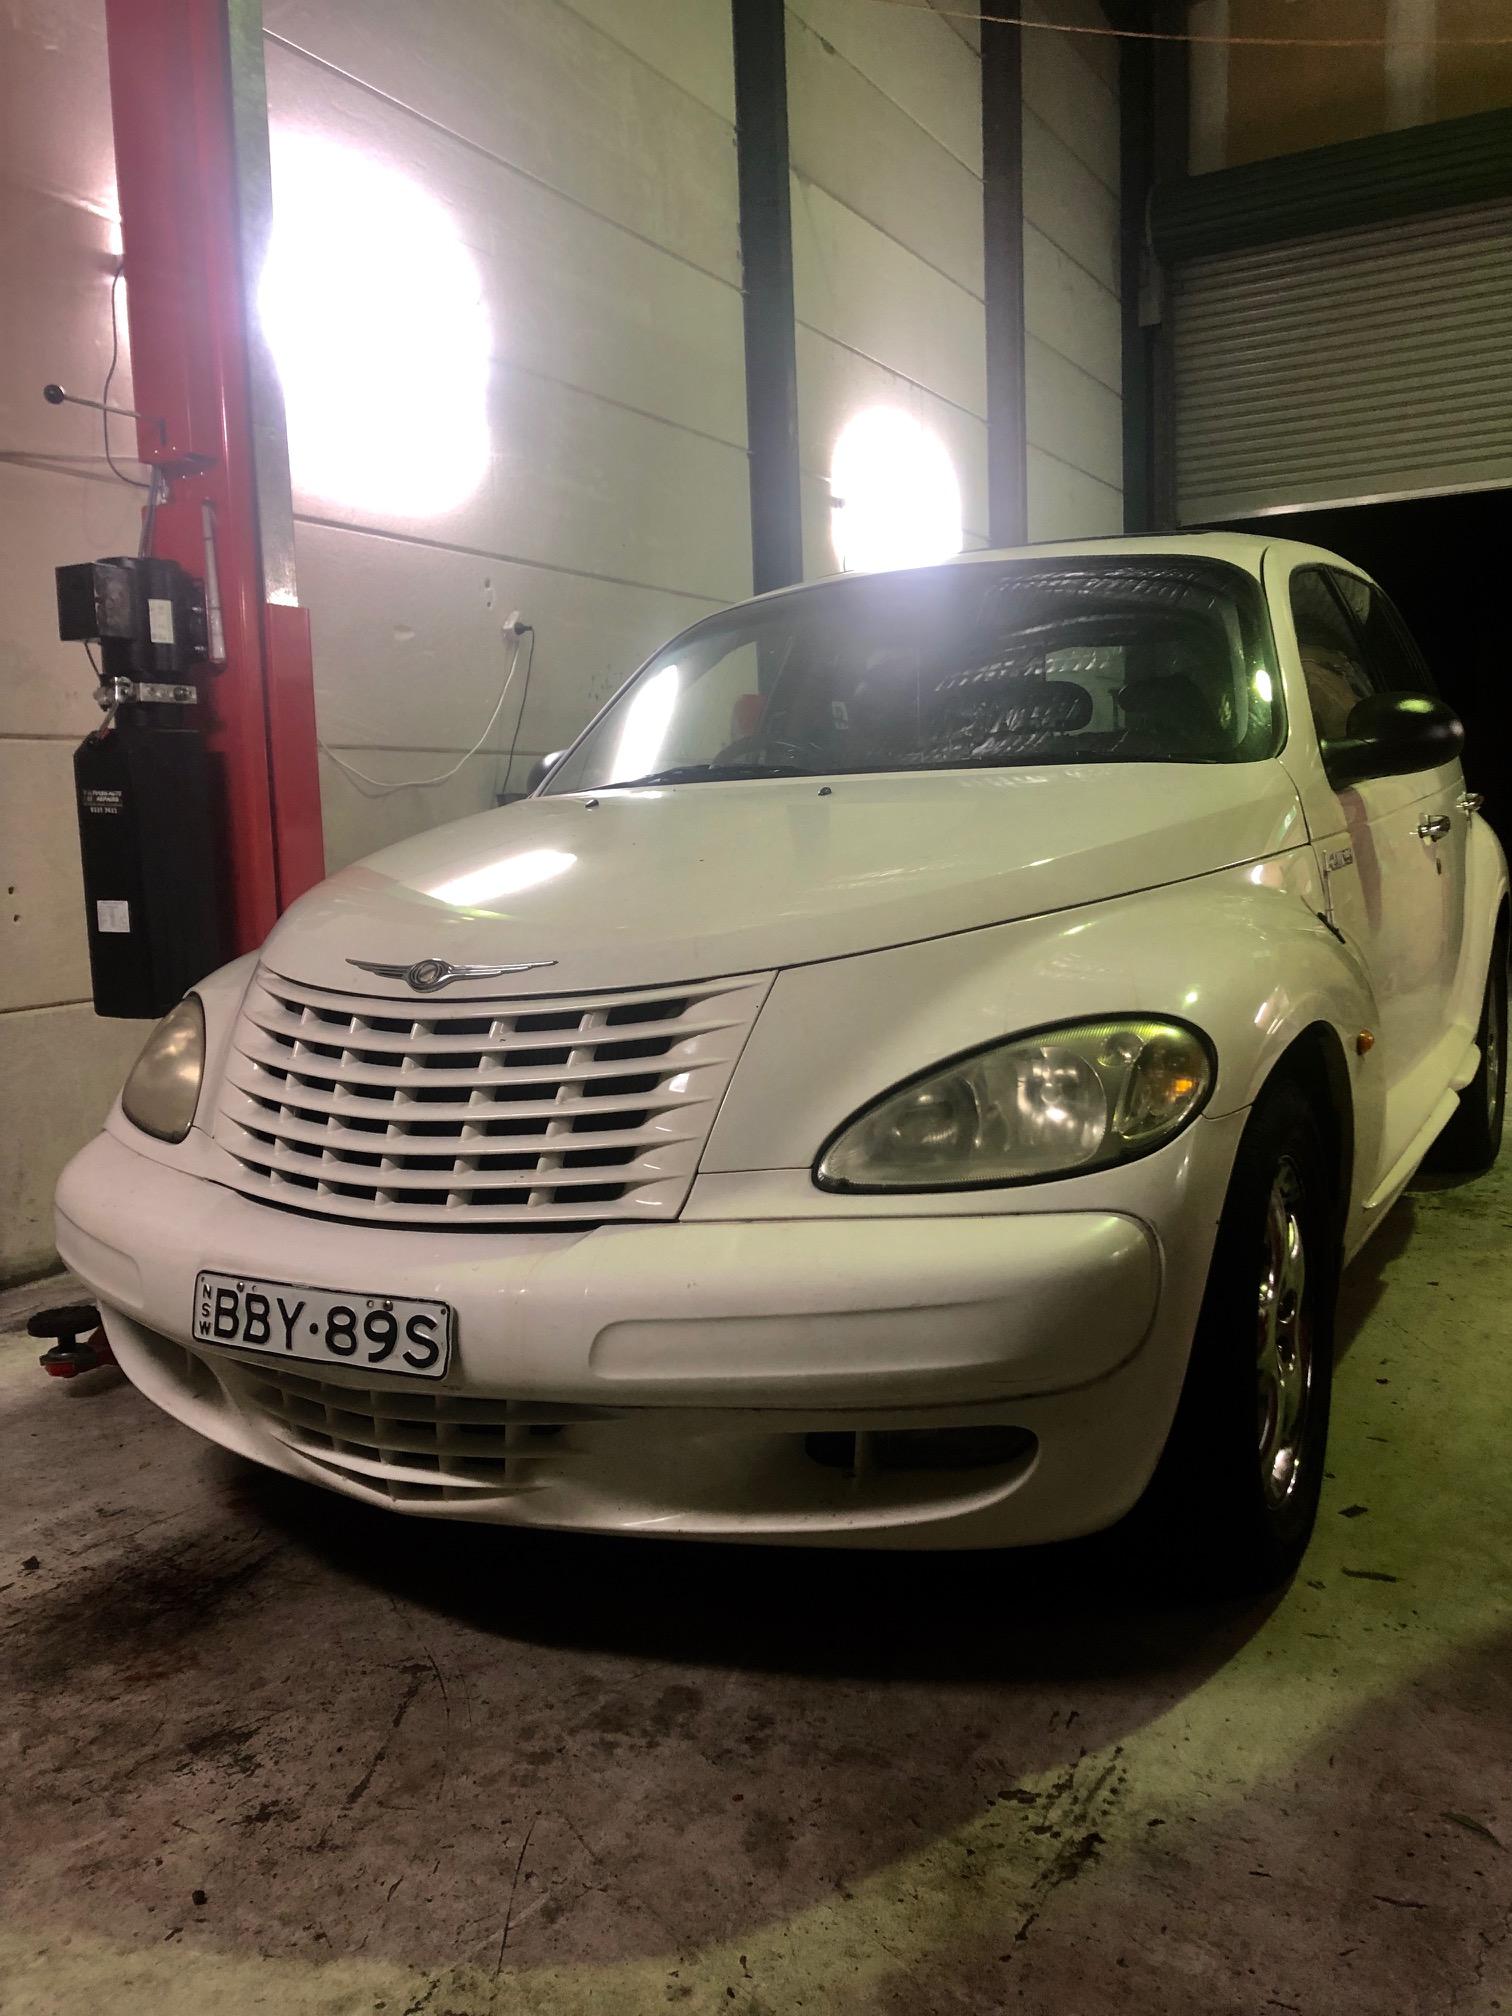 Chrysler specialist sydney